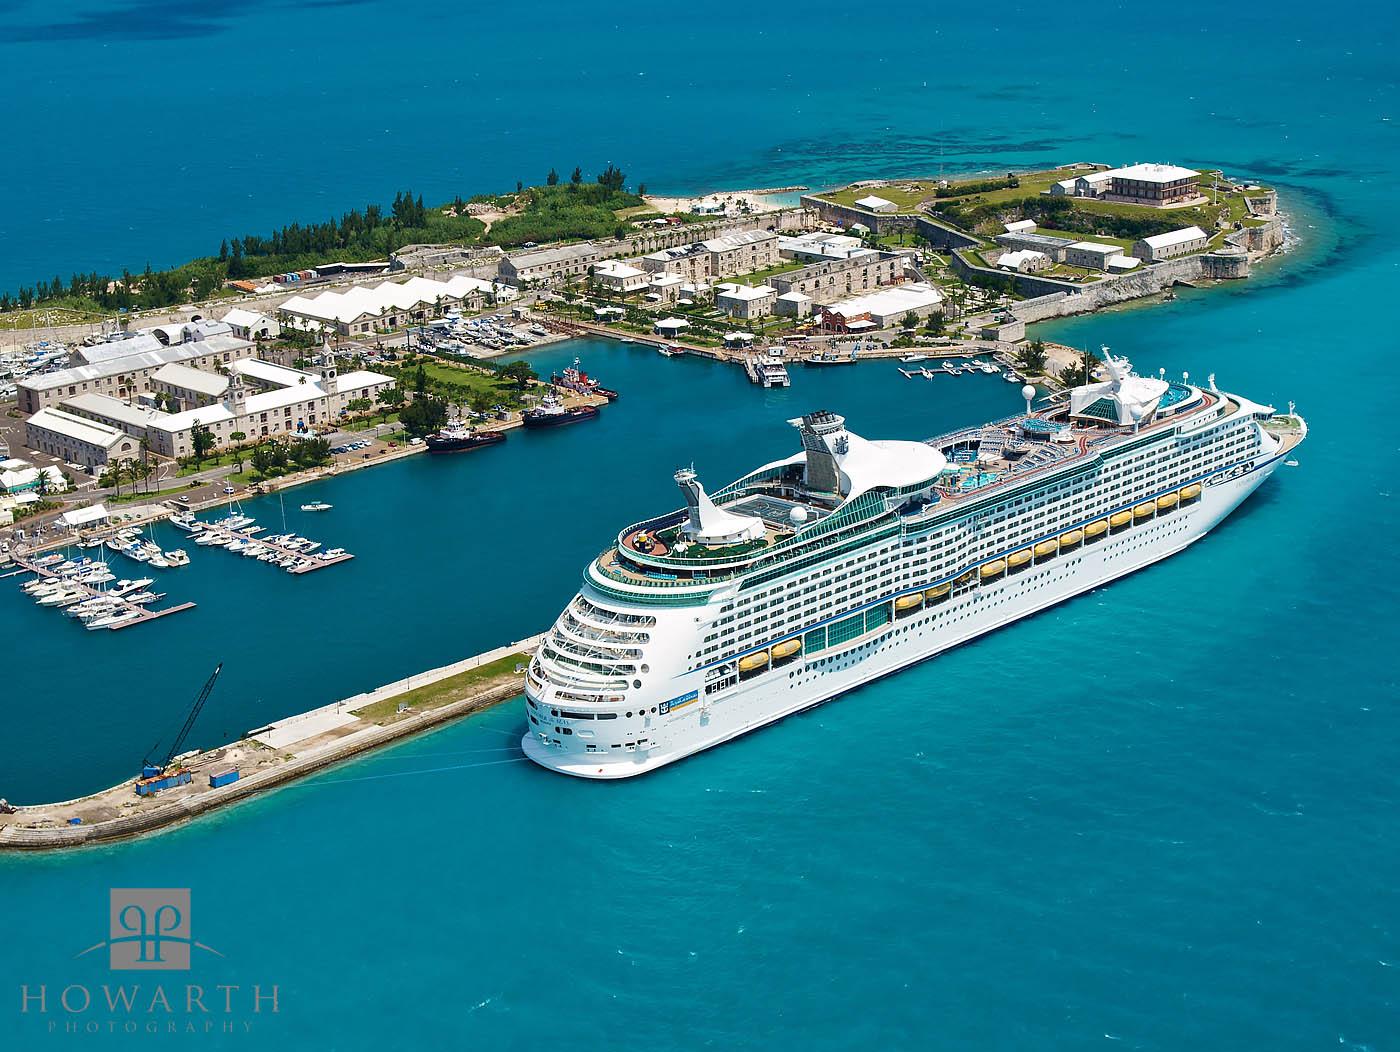 cruise, ship, dockyard, heritage, wharf, somerset, photo